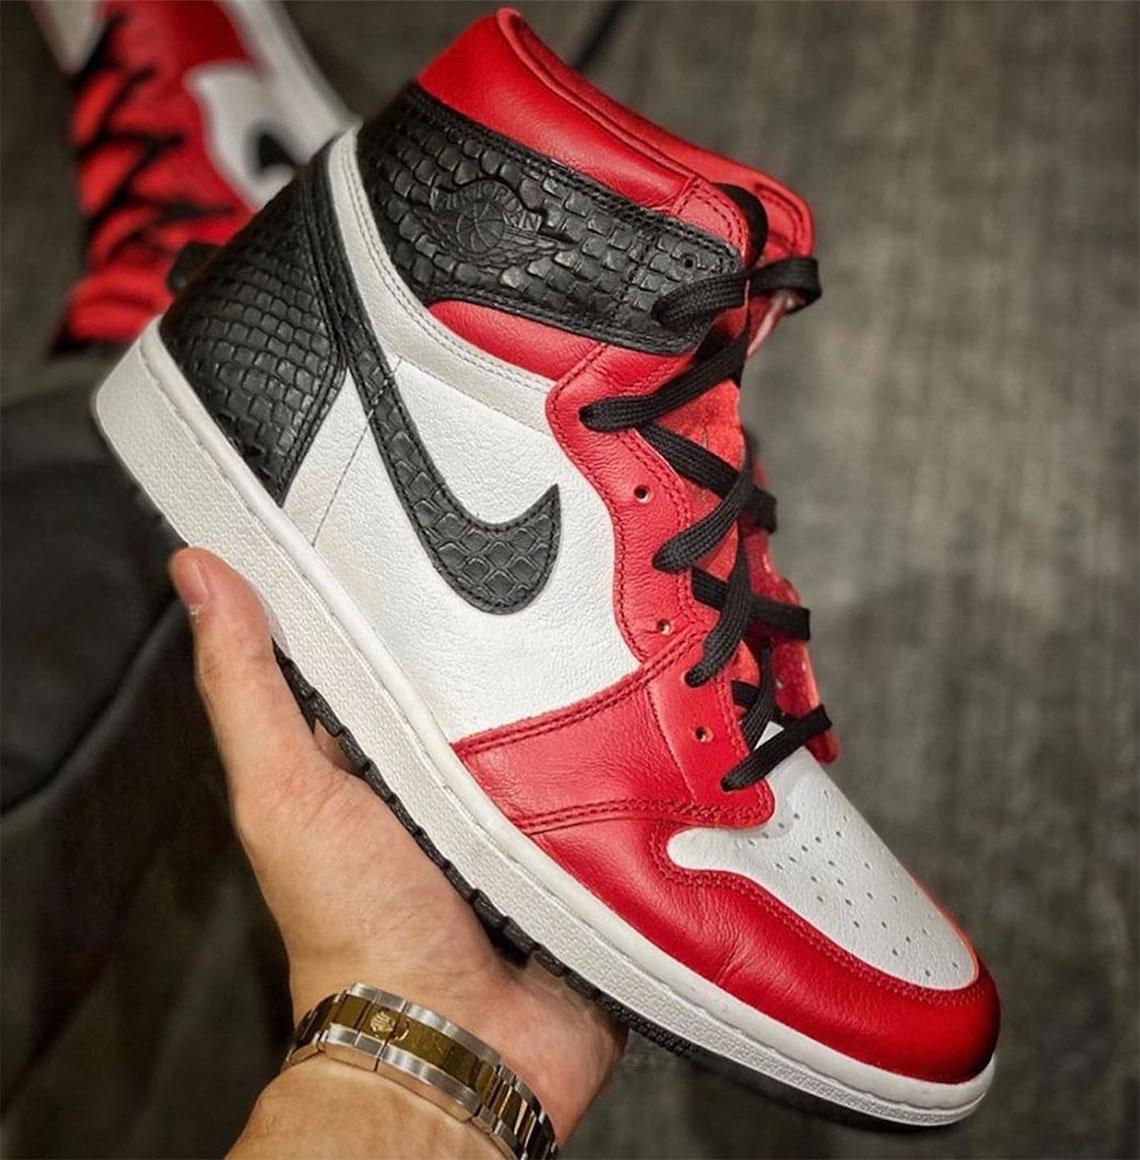 Air Jordan 1 Satin Red WMNS CD0461-601 Release | SneakerNews.com